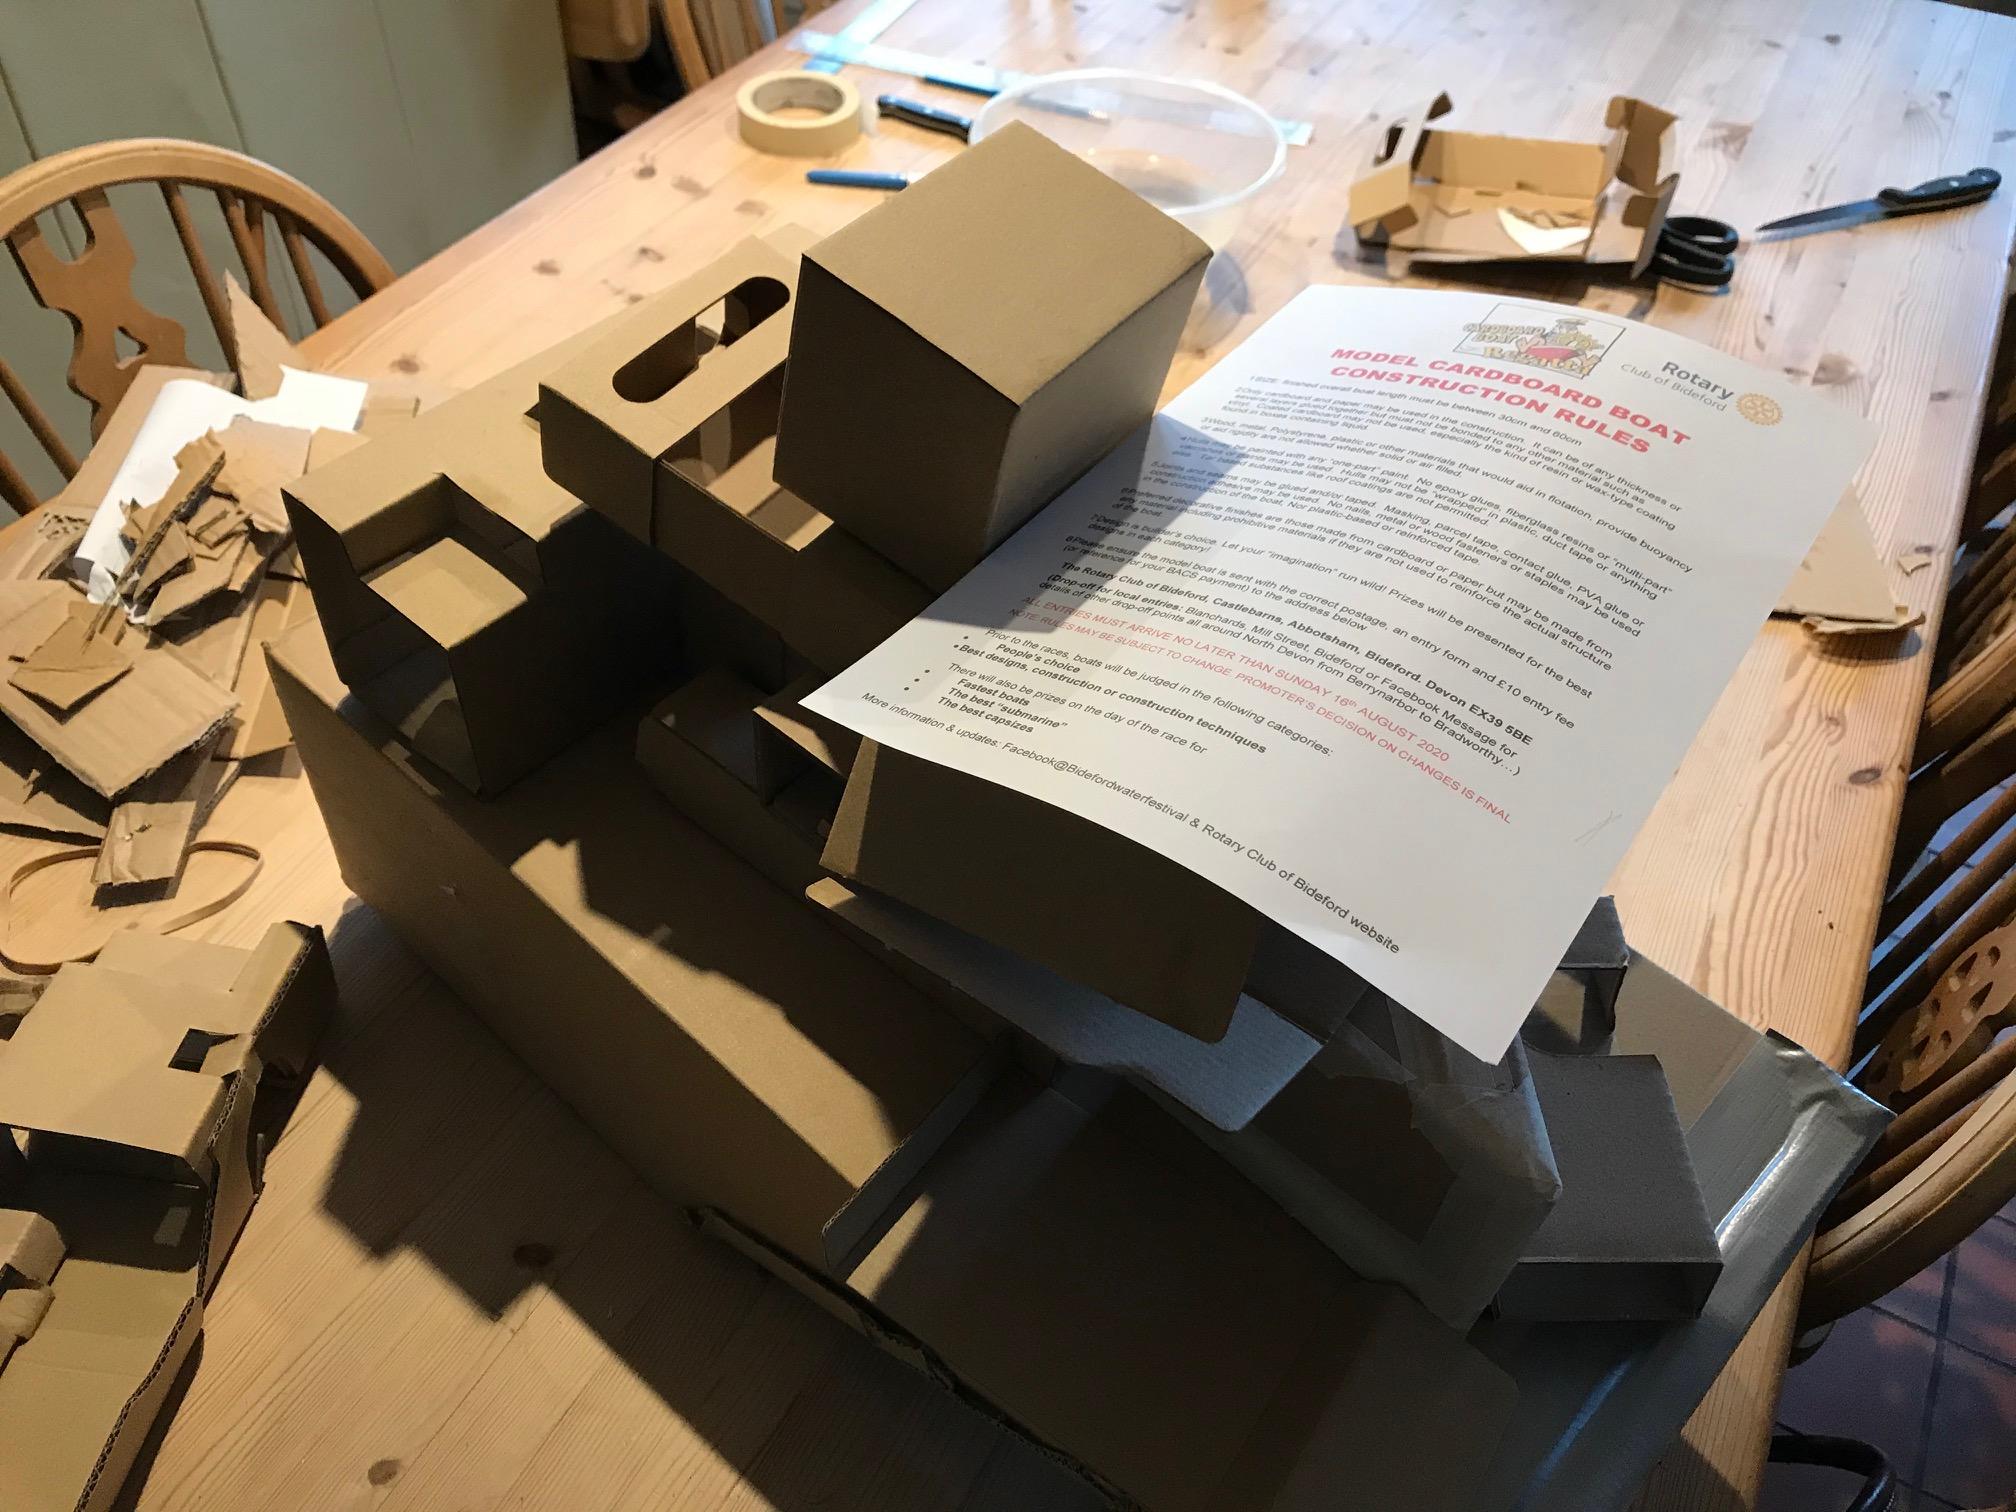 Model boat building for Bideford Water Festival